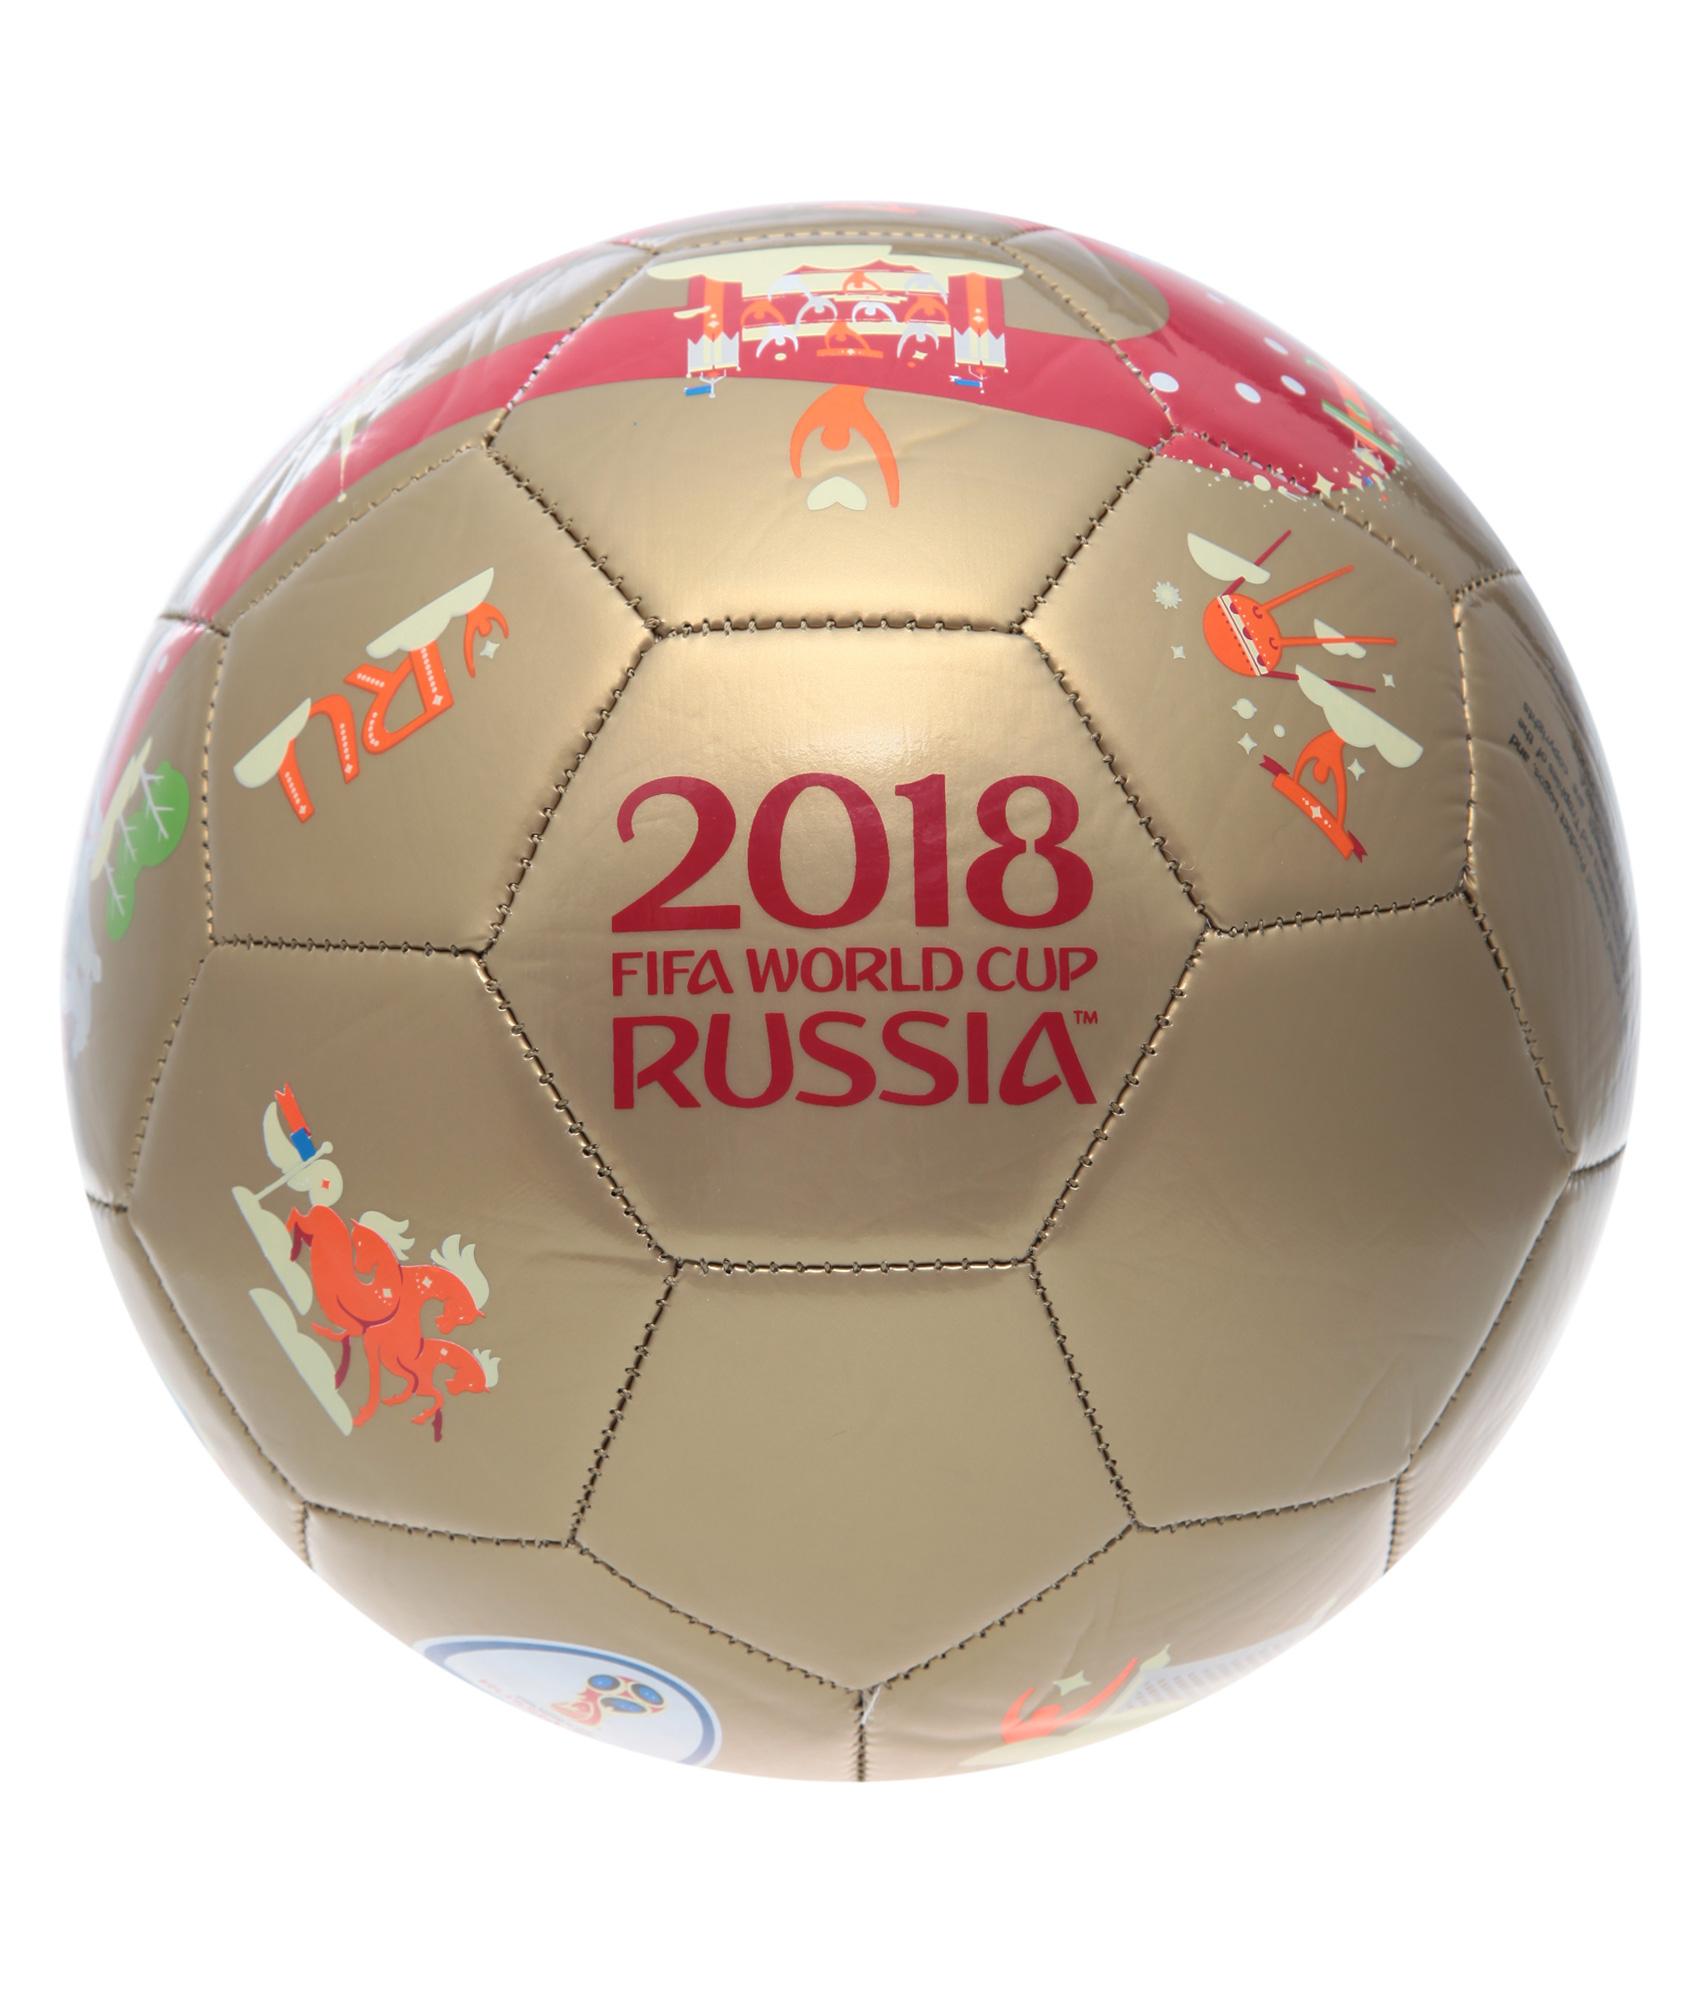 Мяч «Санкт-Петербург» Зенит